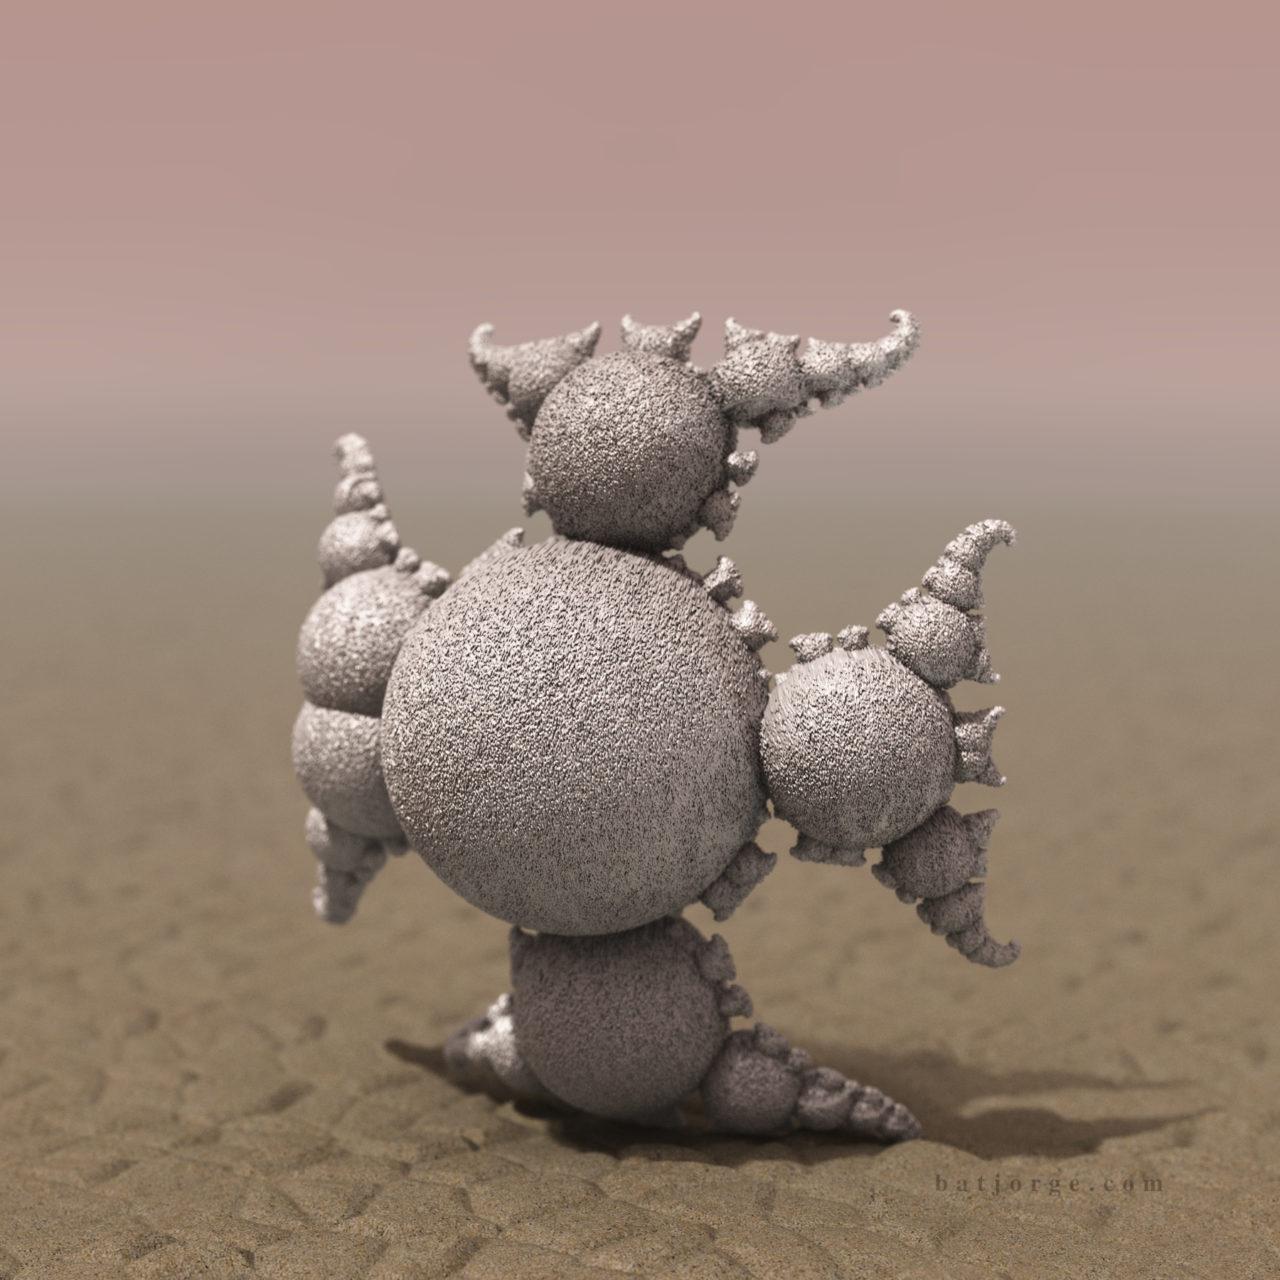 3D fractal orb. mandelbulber pseudokleinian mod 4 desert